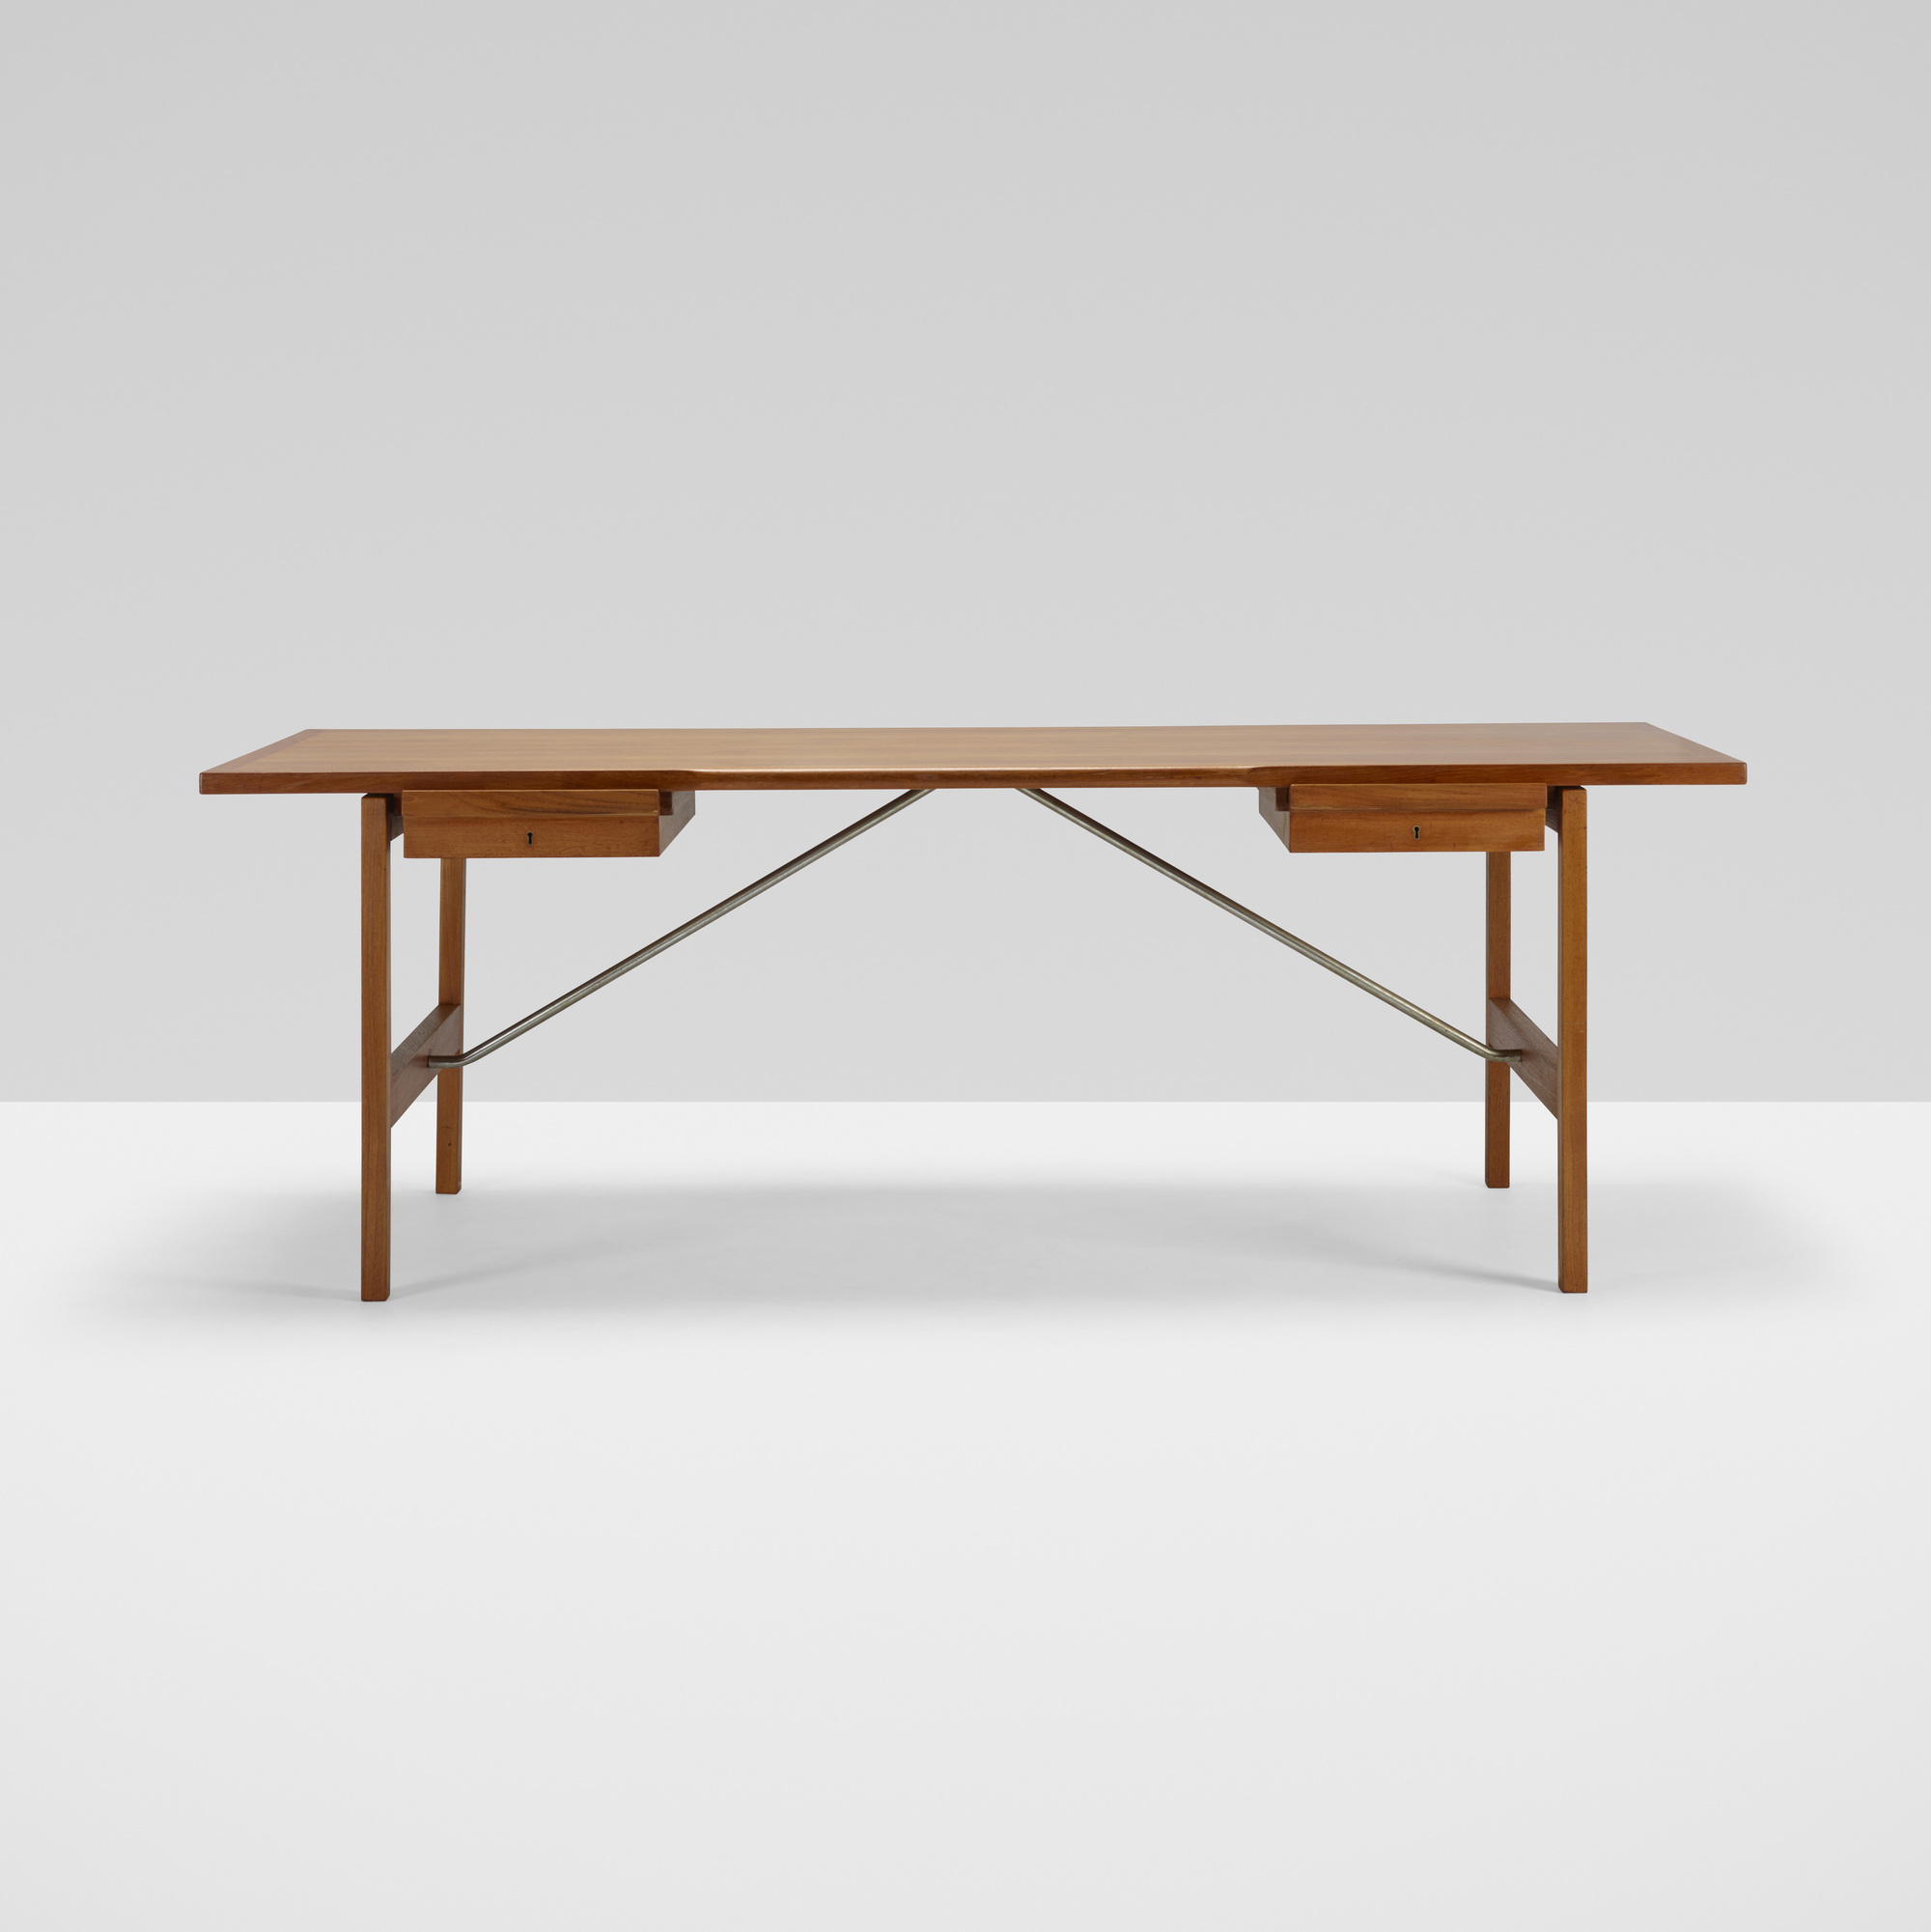 379 Hans J Wegner Desk Model At325 A U003c Design 9 June 2017 Rh Wright20 Com Jh 571 For